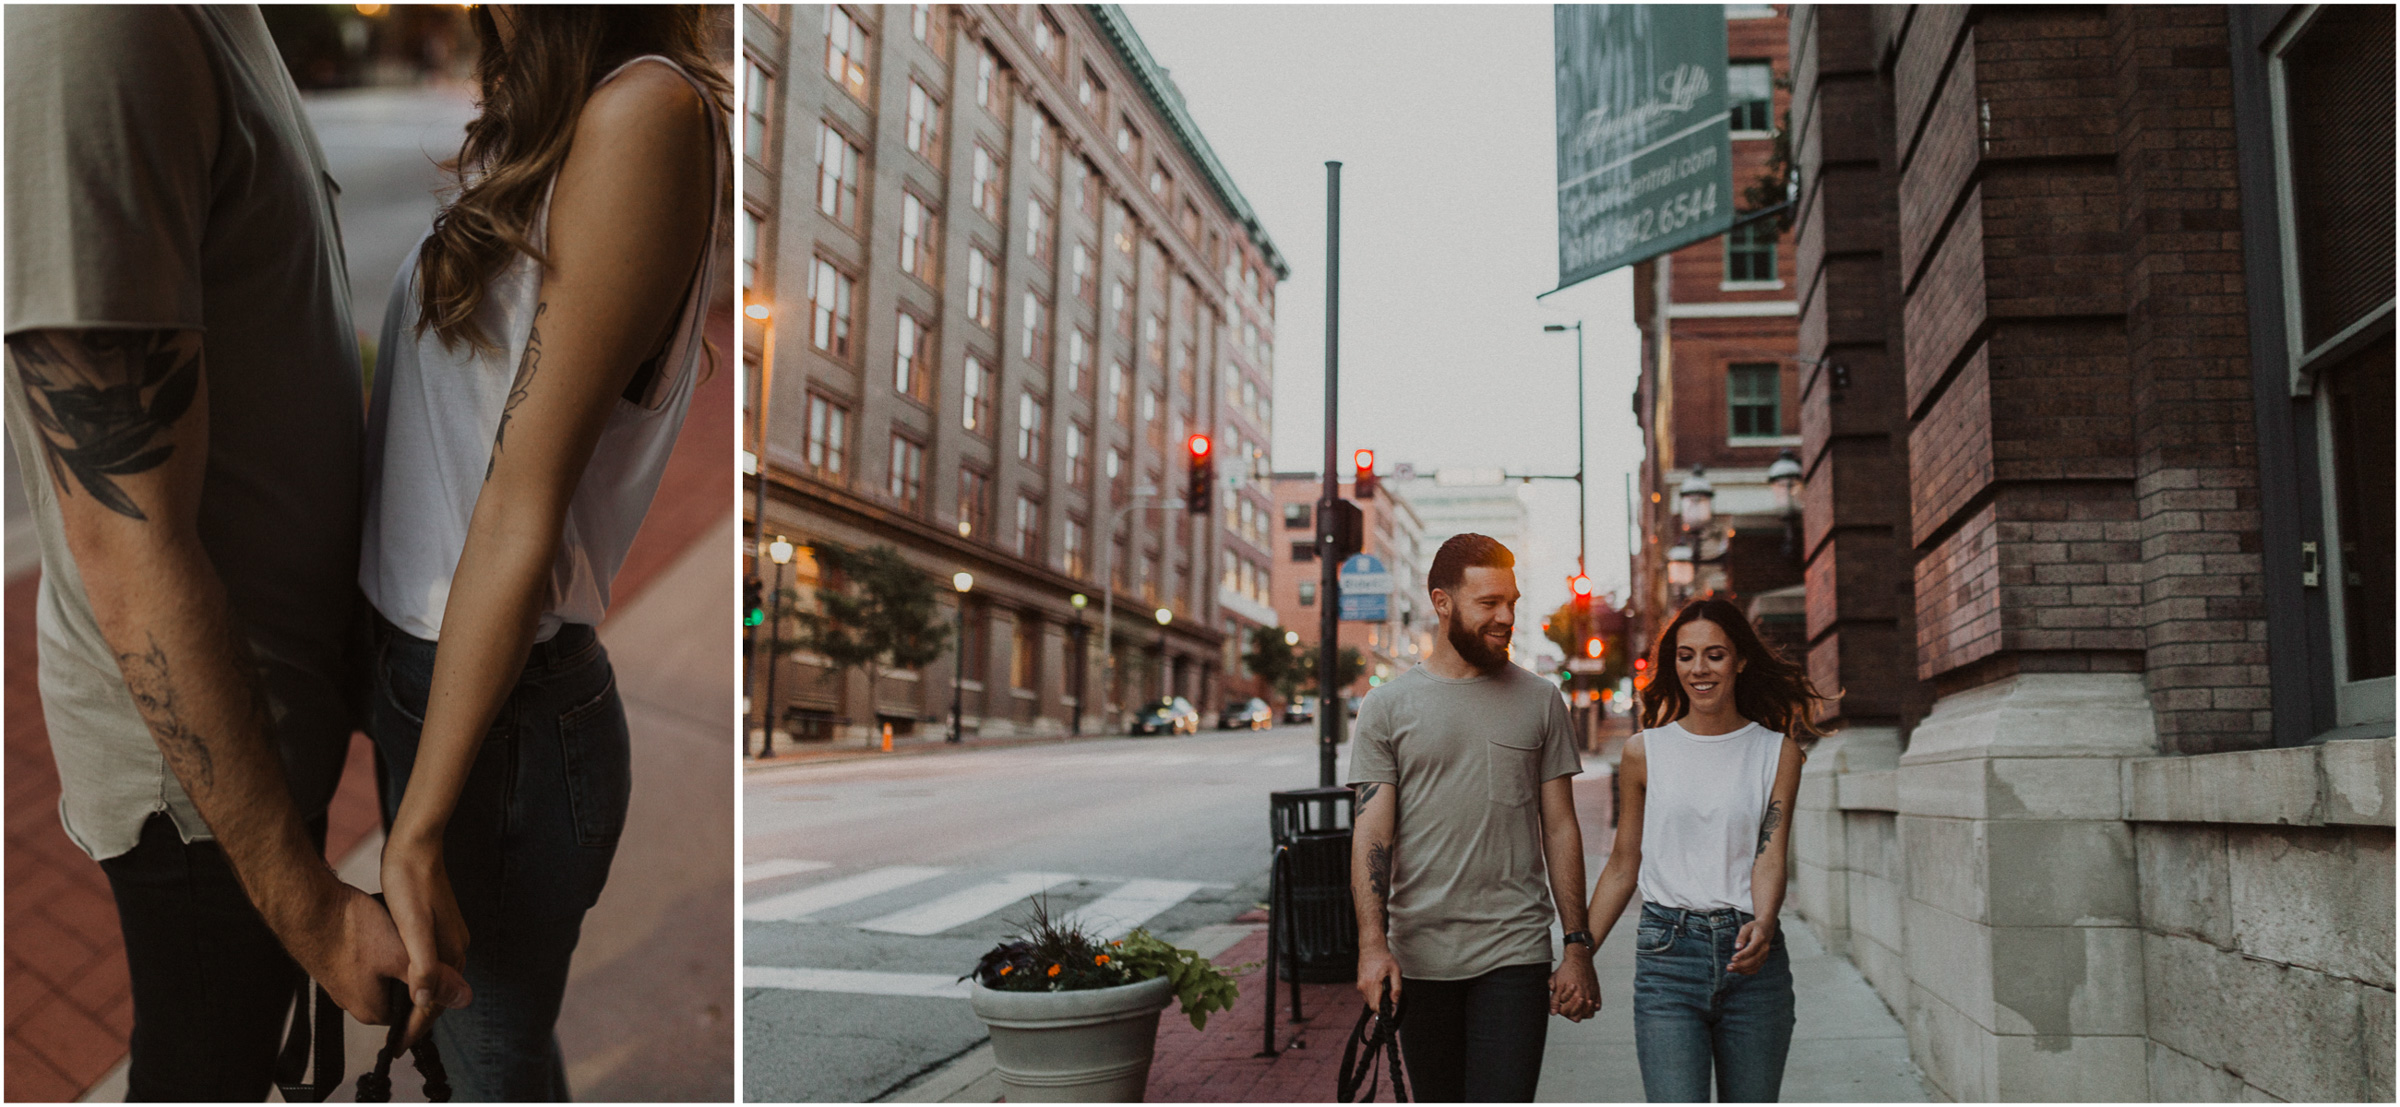 alyssa barletter photography downtown kansas city photos with couple and aussies austrailian shepards-13.jpg